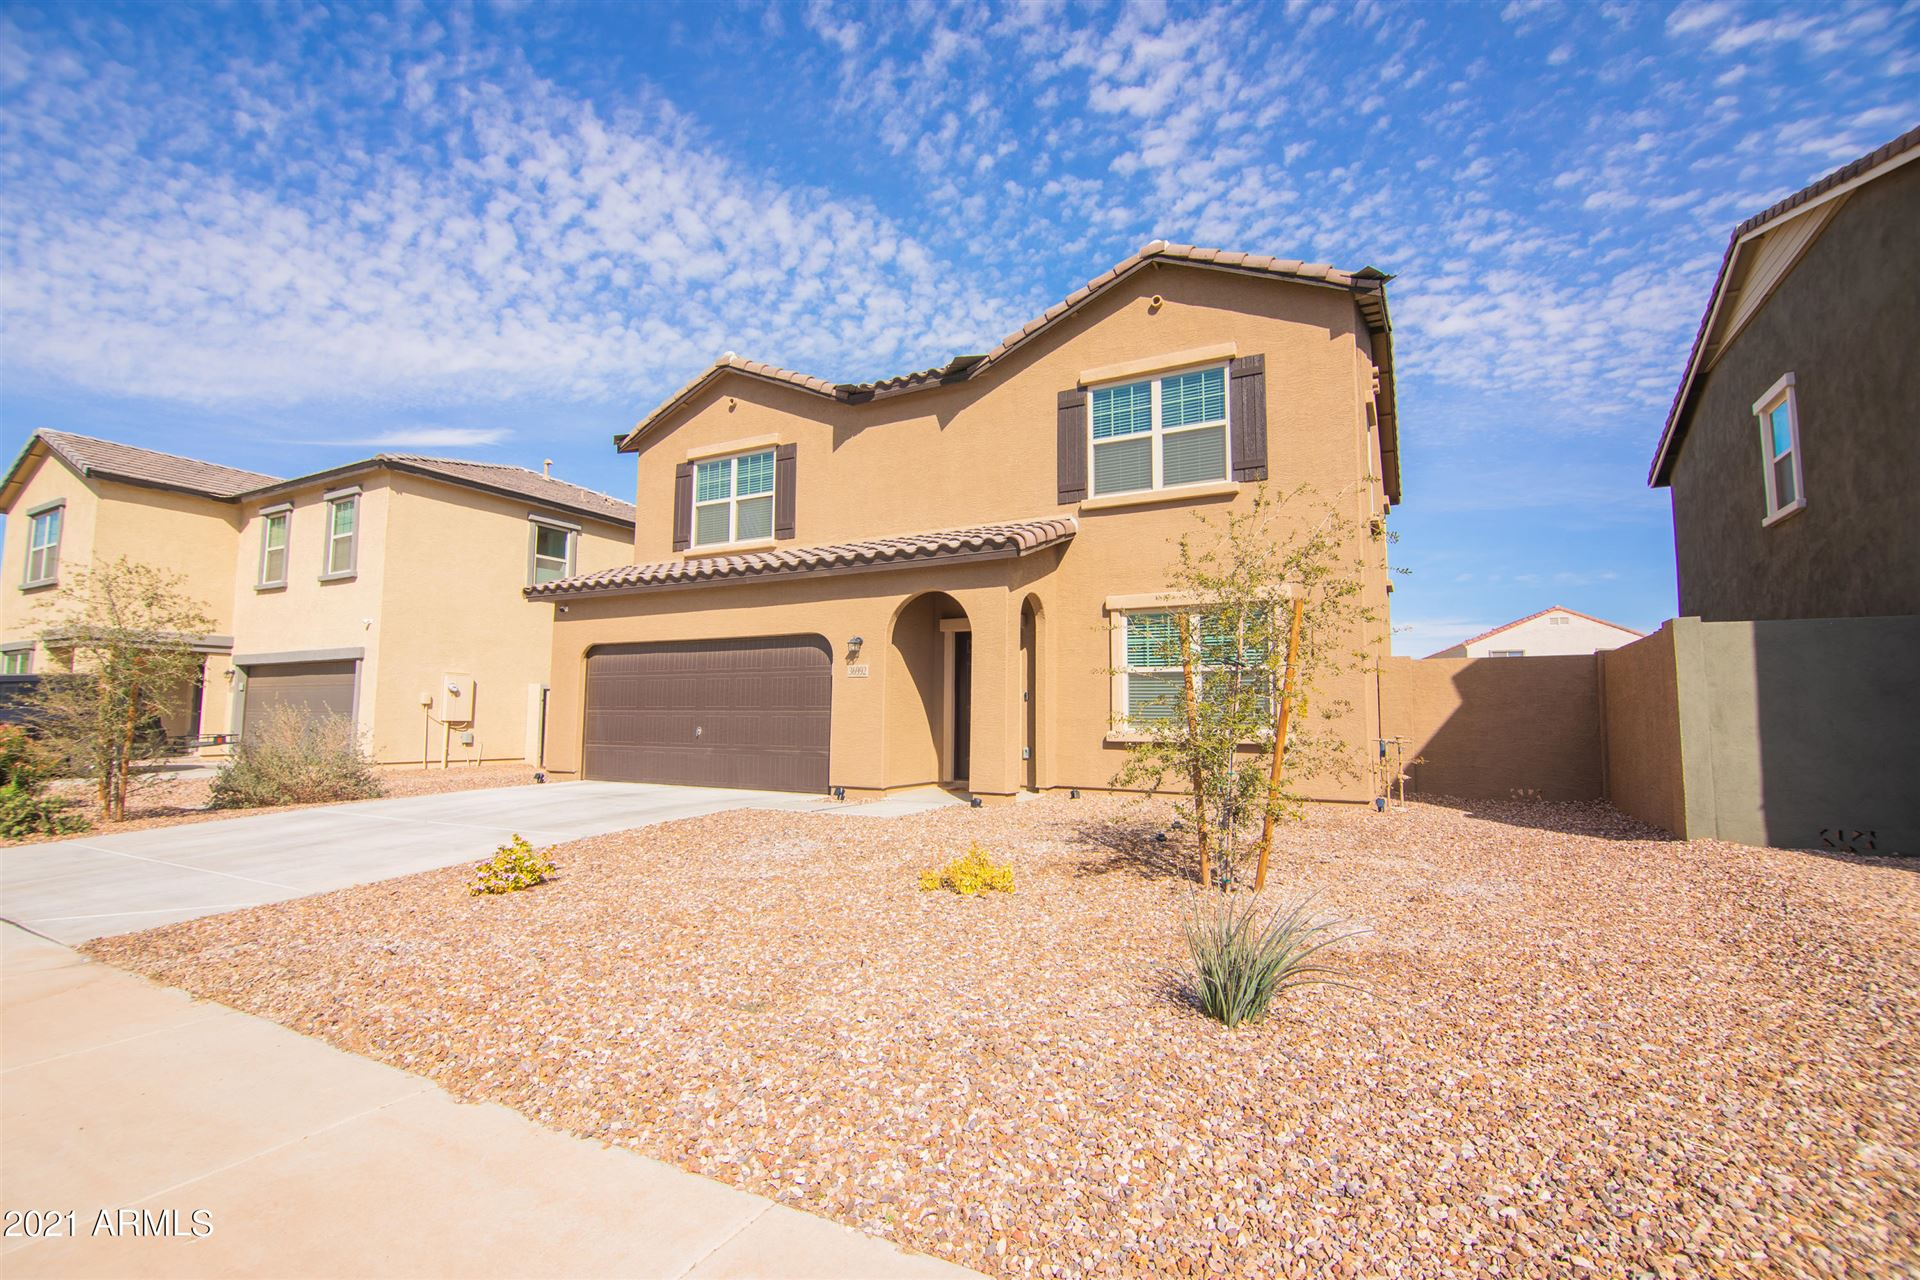 Photo of 36992 W CAPRI Avenue, Maricopa, AZ 85138 (MLS # 6199067)